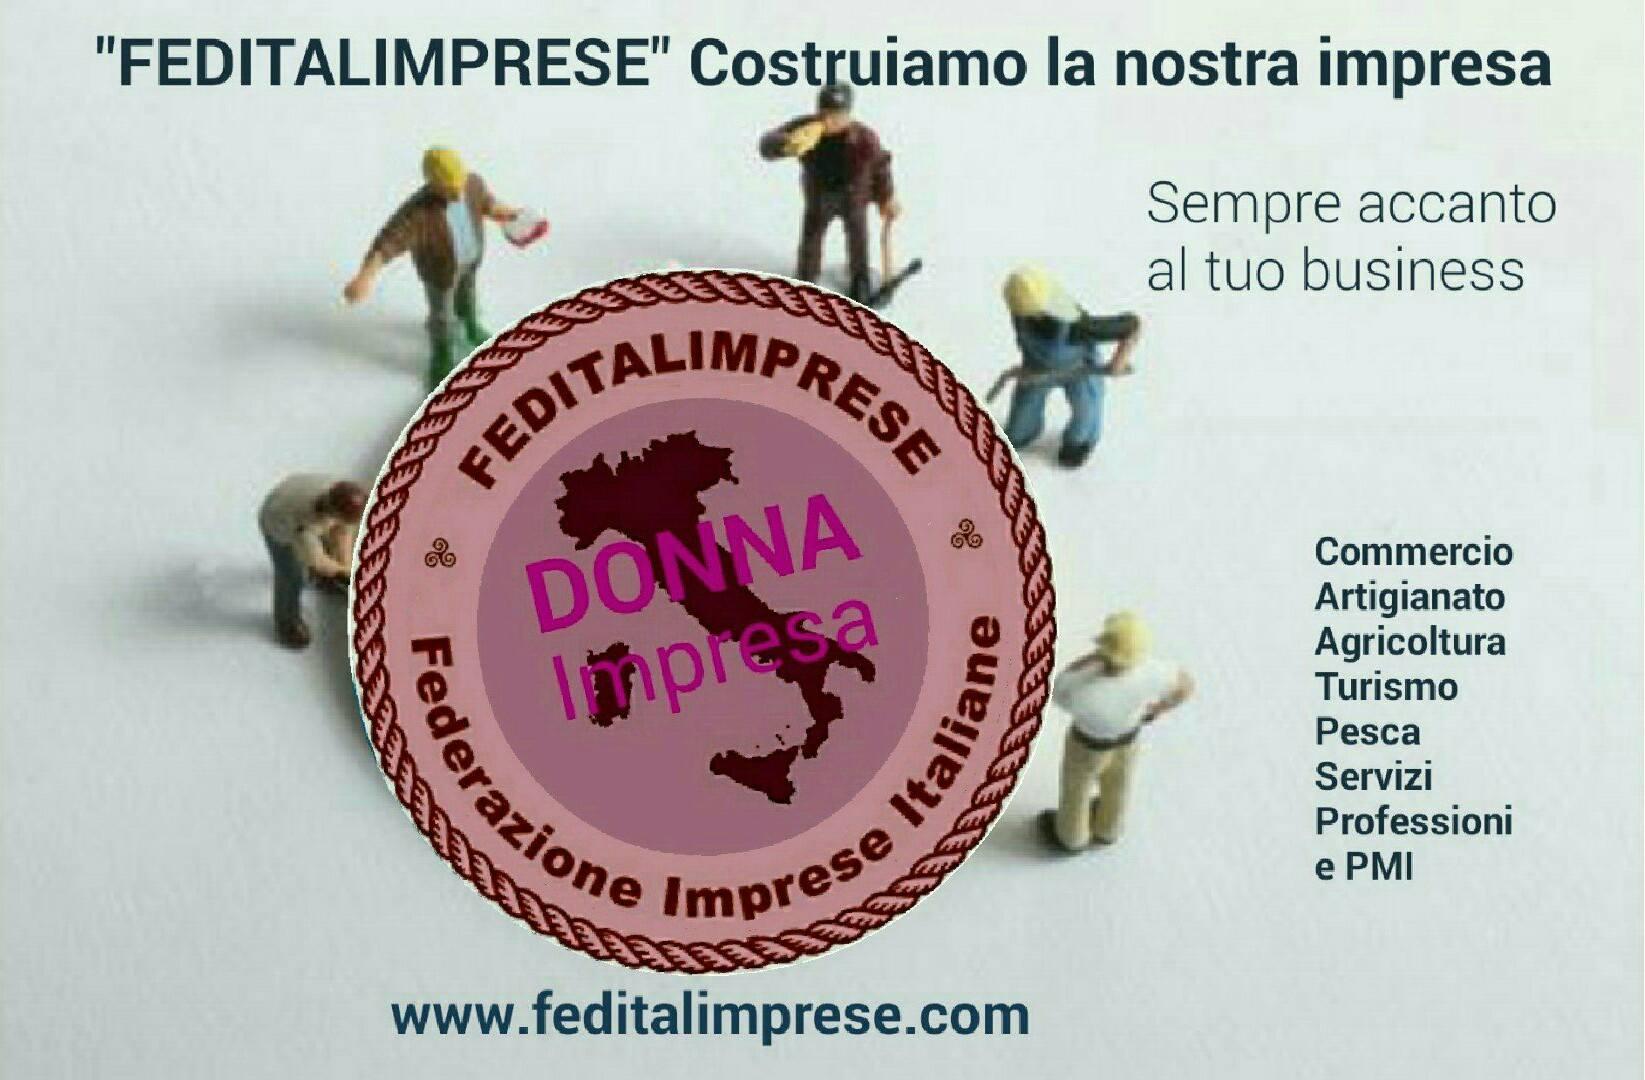 Feditalimprese Donna Impresa